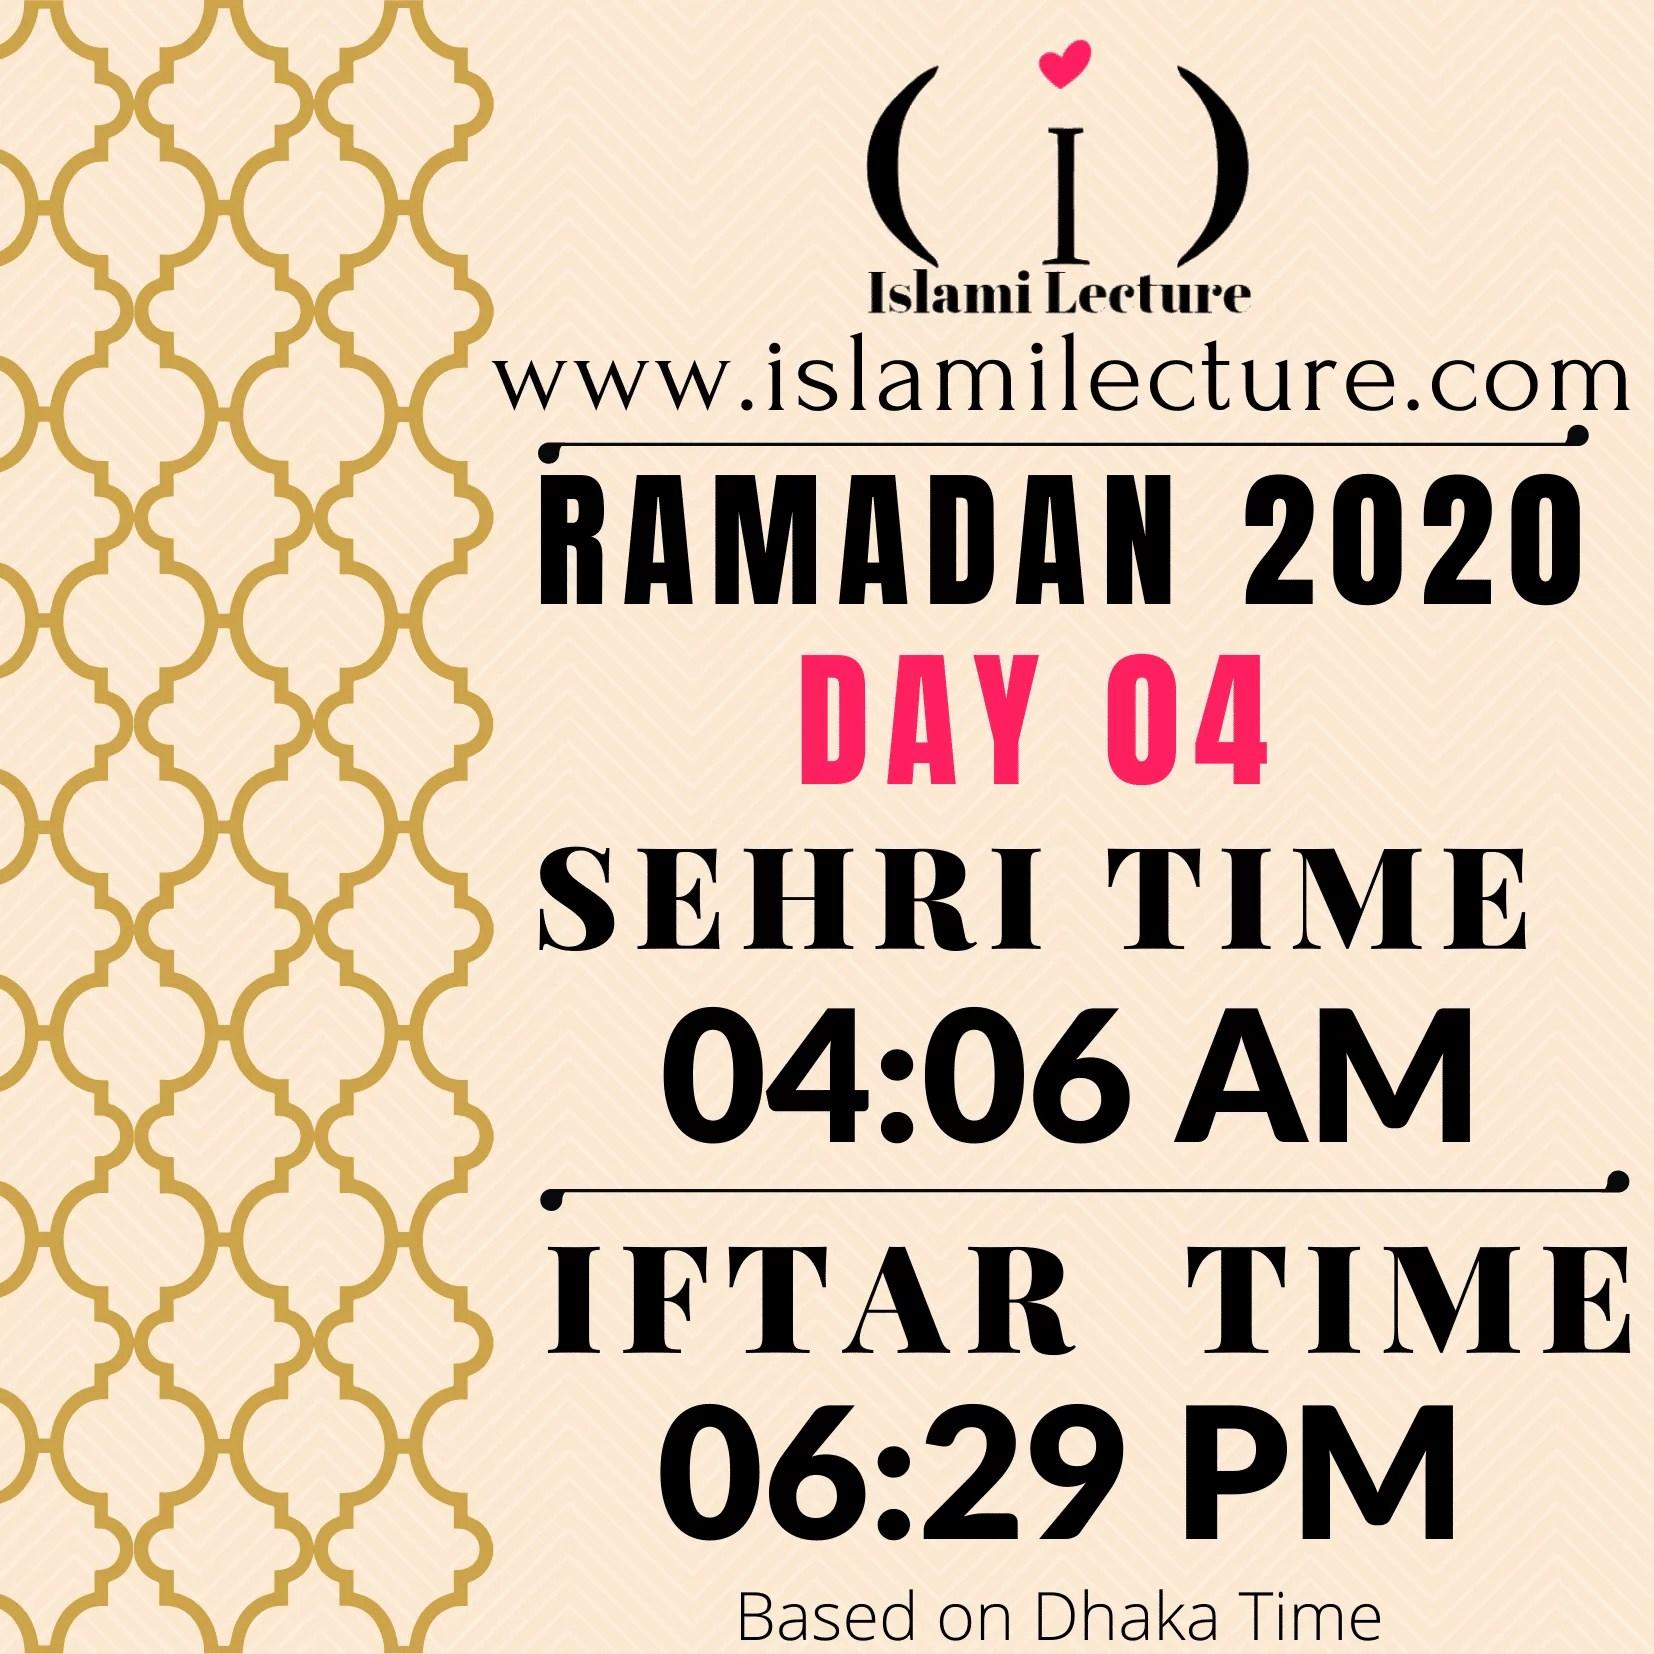 Dhaka Ramadan Time 2020 Sehri & Iftar Time (Day 04)